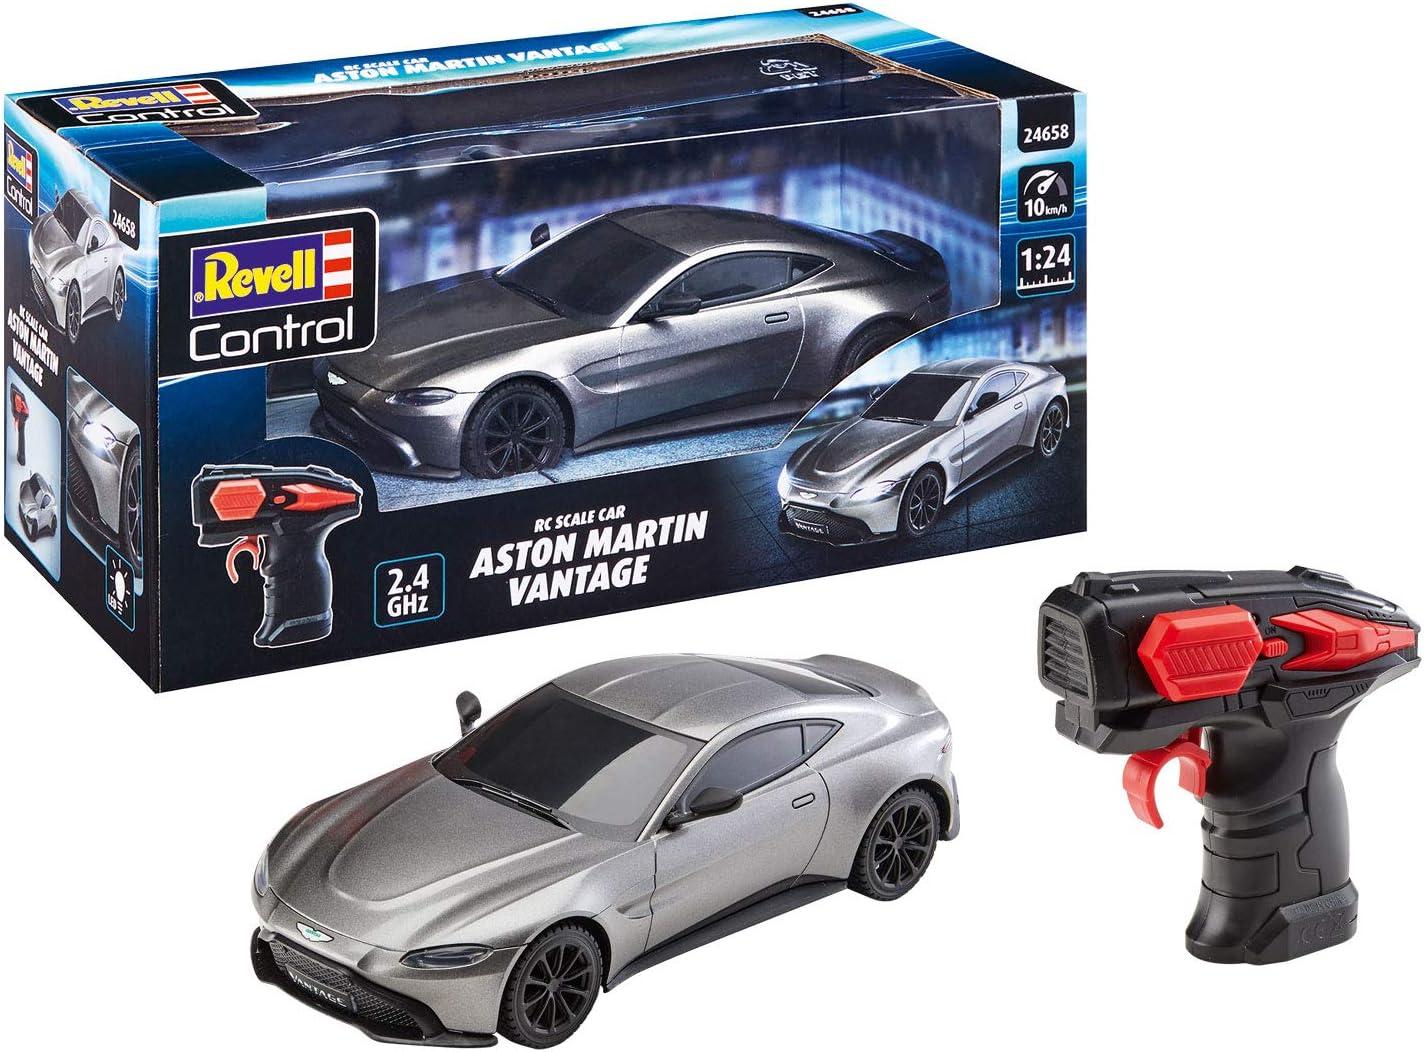 Revell 24658 Aston Martin Vantage Ferngesteuertes Auto Silbergrau Amazon De Spielzeug